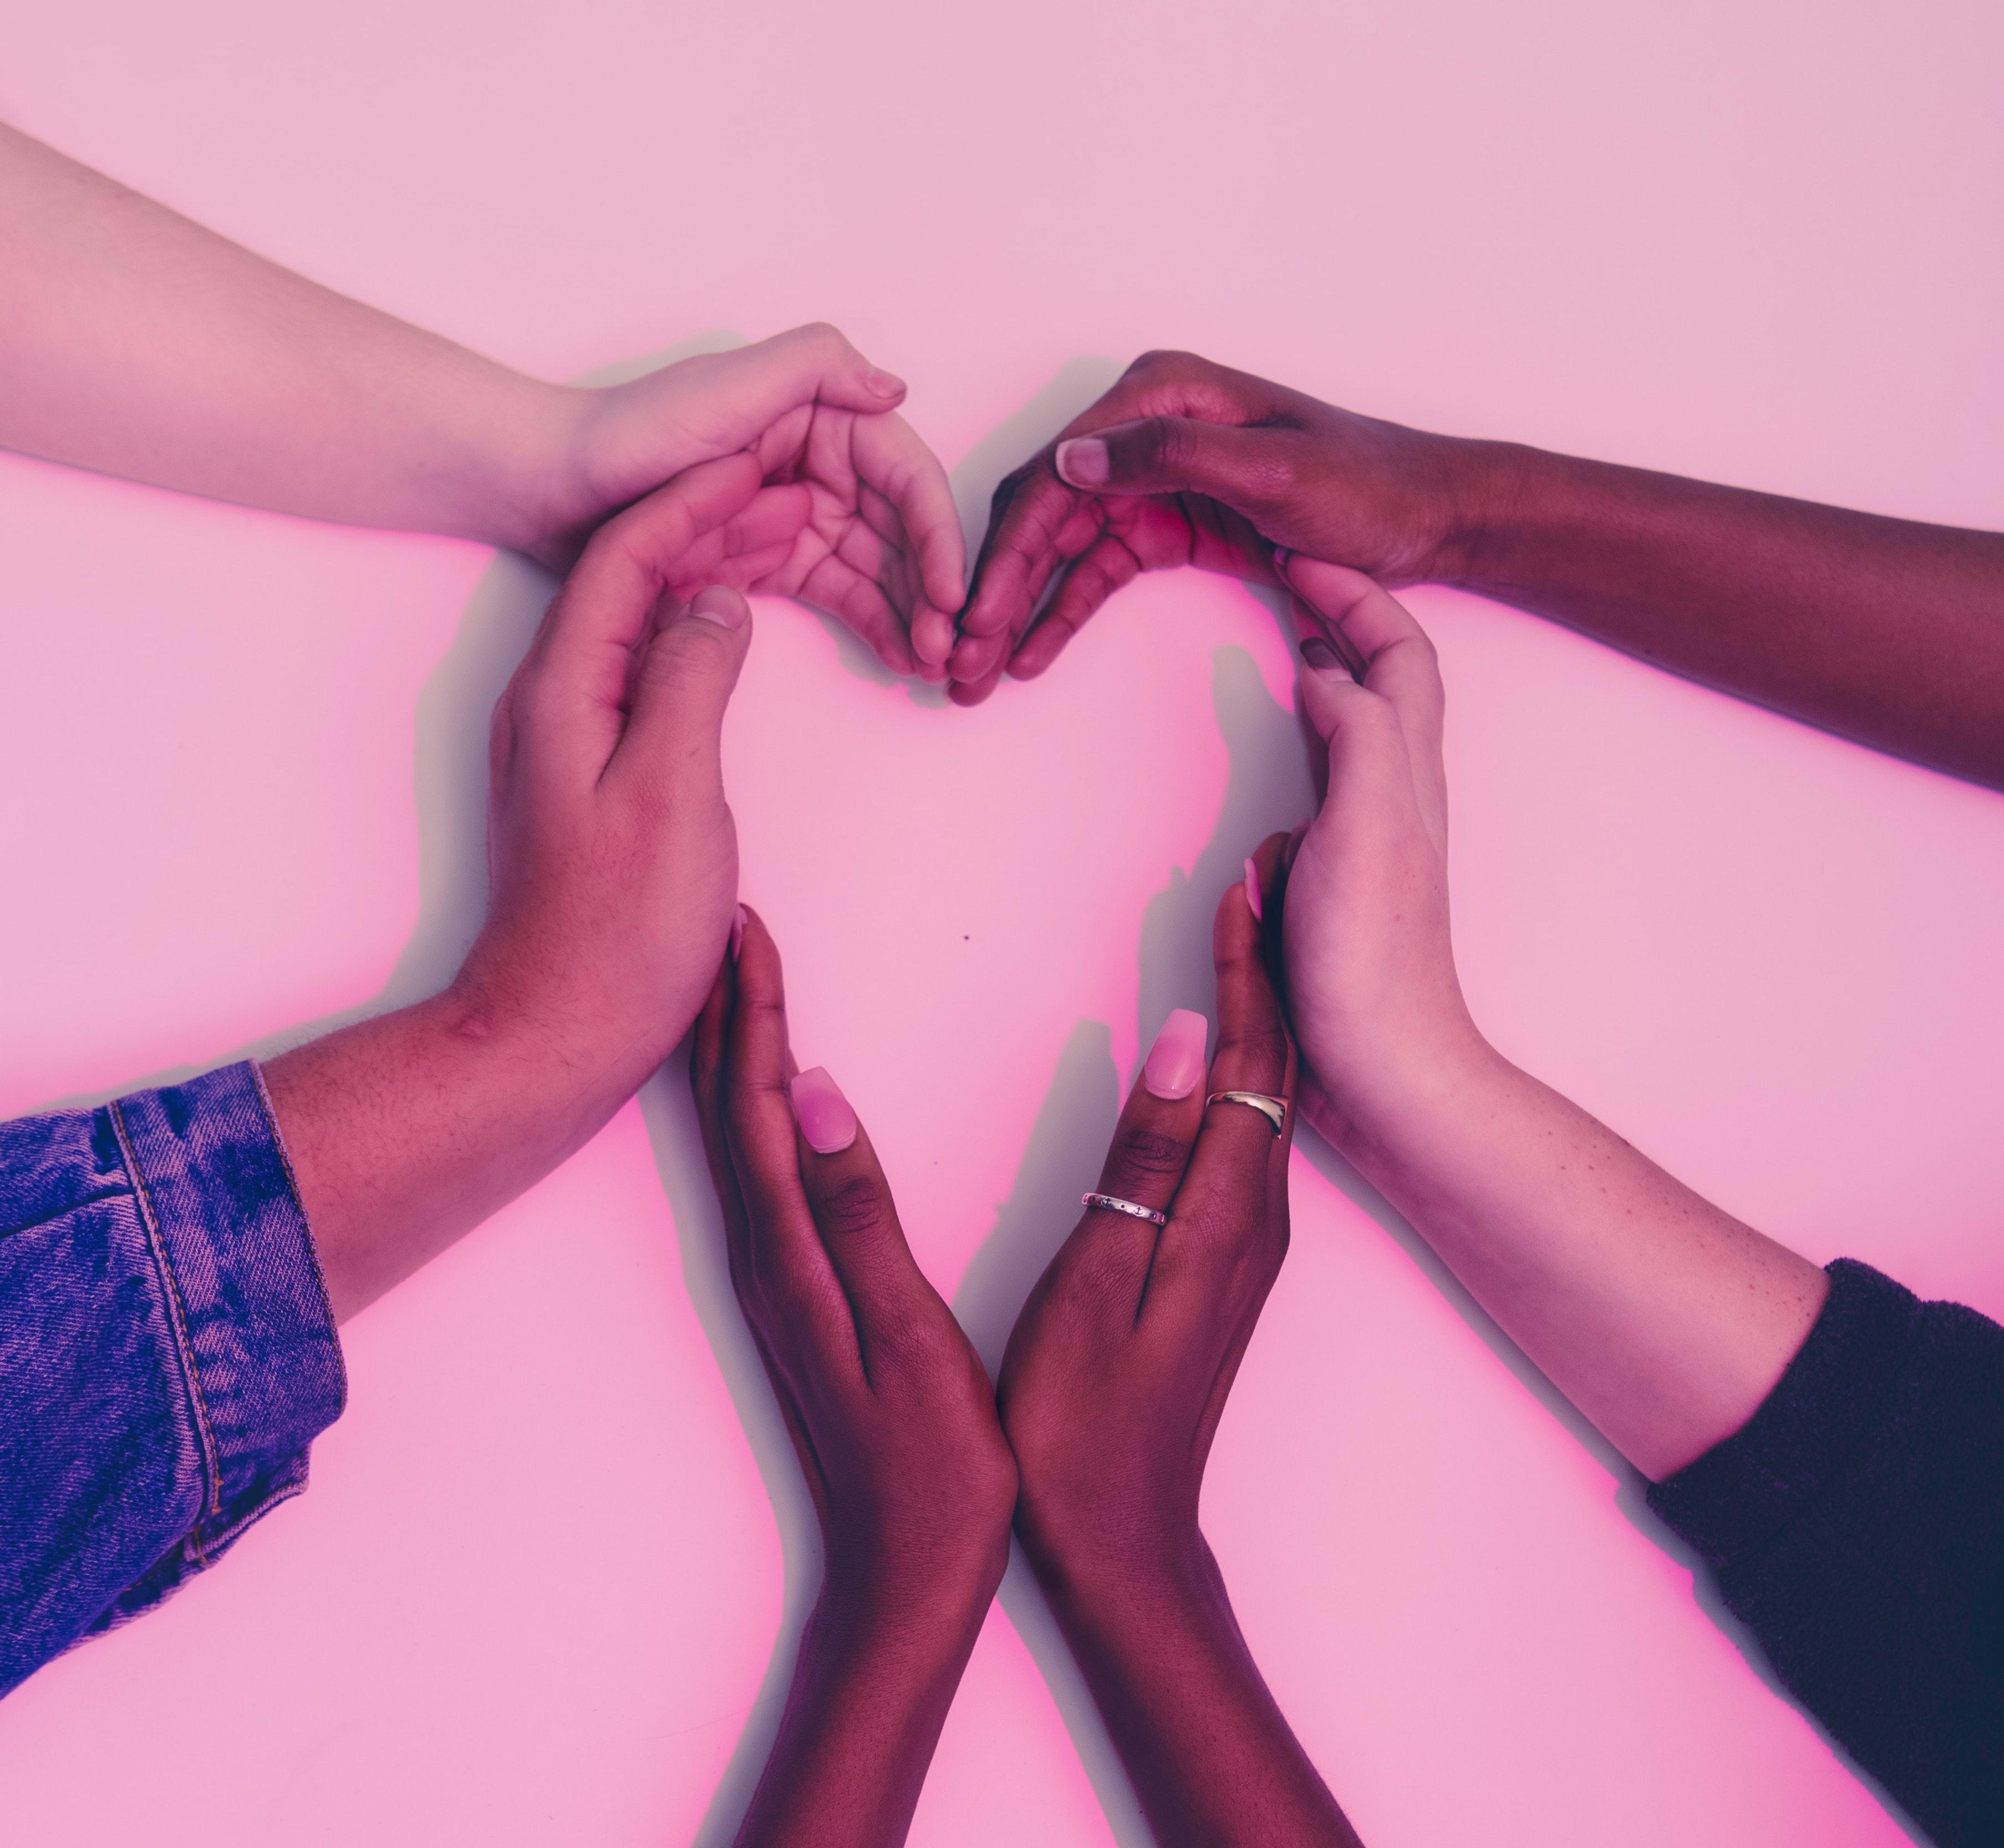 hands-heart-love-305530 (1) (1)